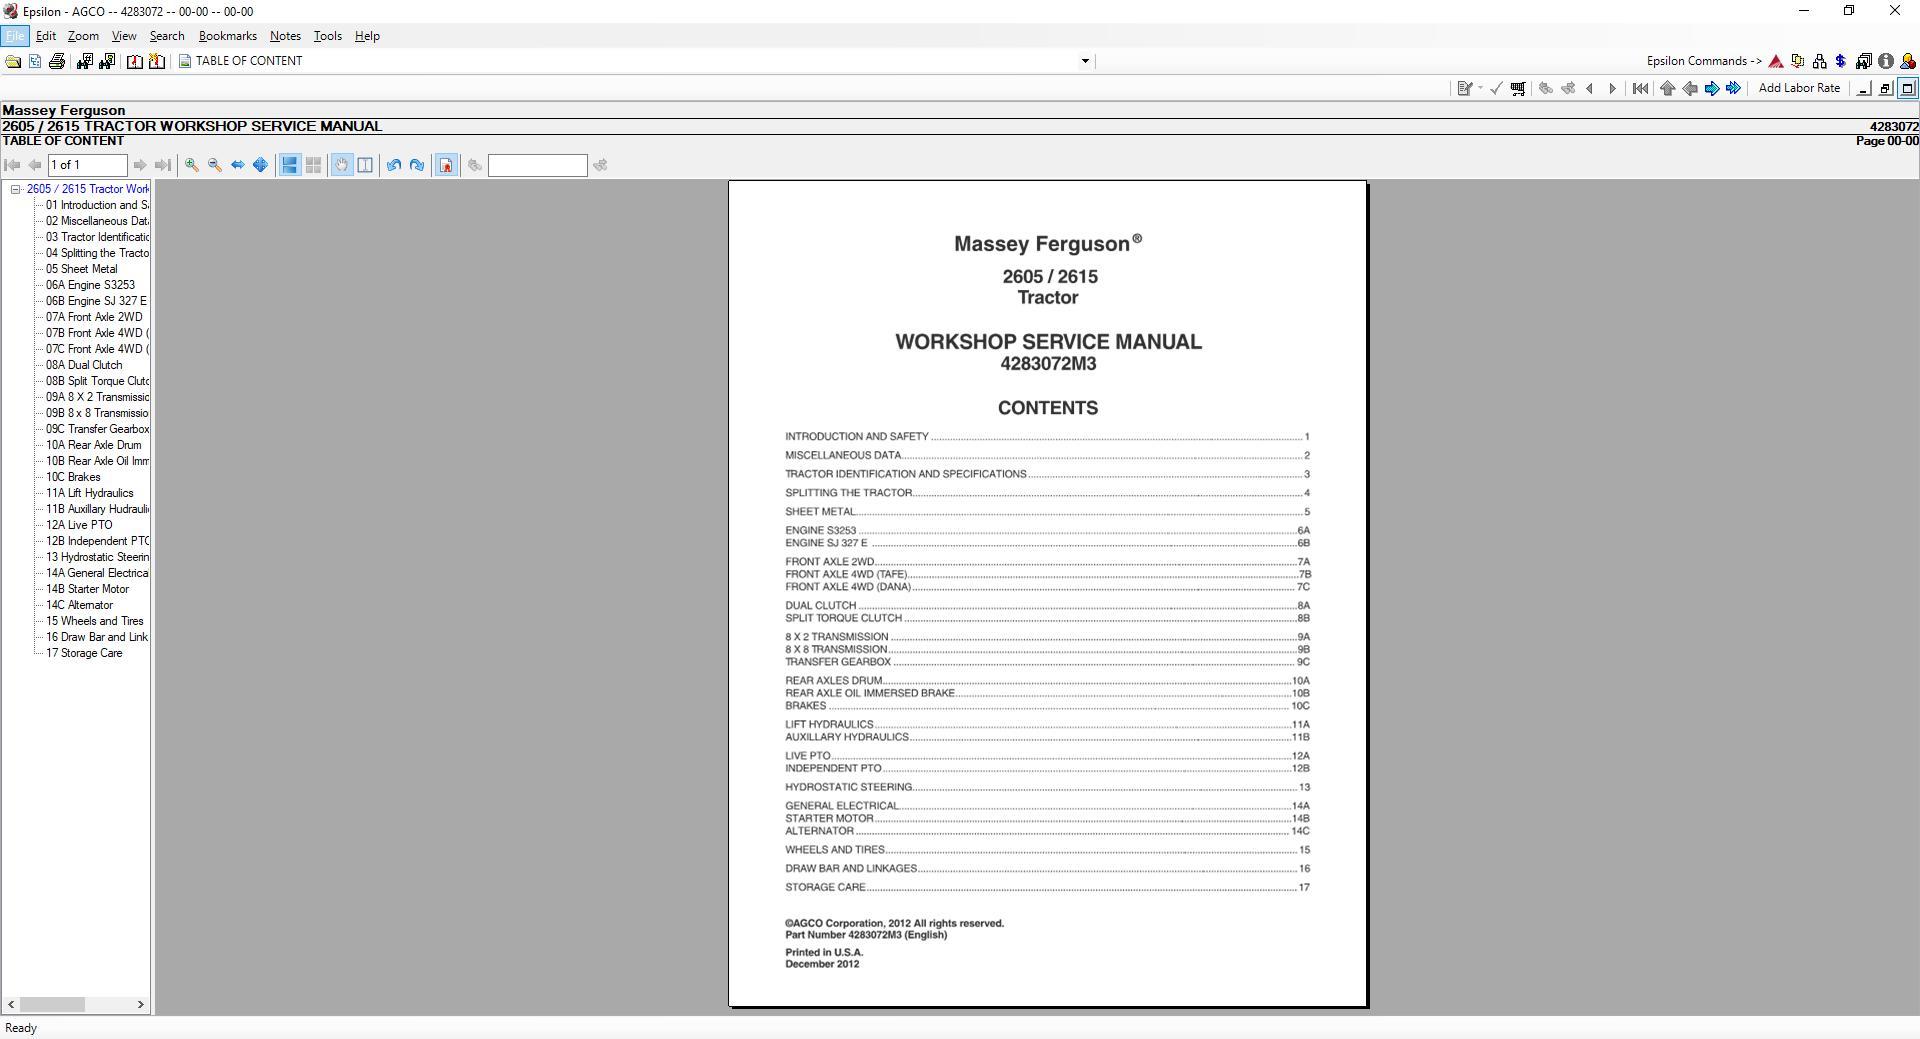 Massey_Ferguson_-_AG_Tractor_NA_Workshop_Service_Manuals_and_Service_Bulletins_0520197